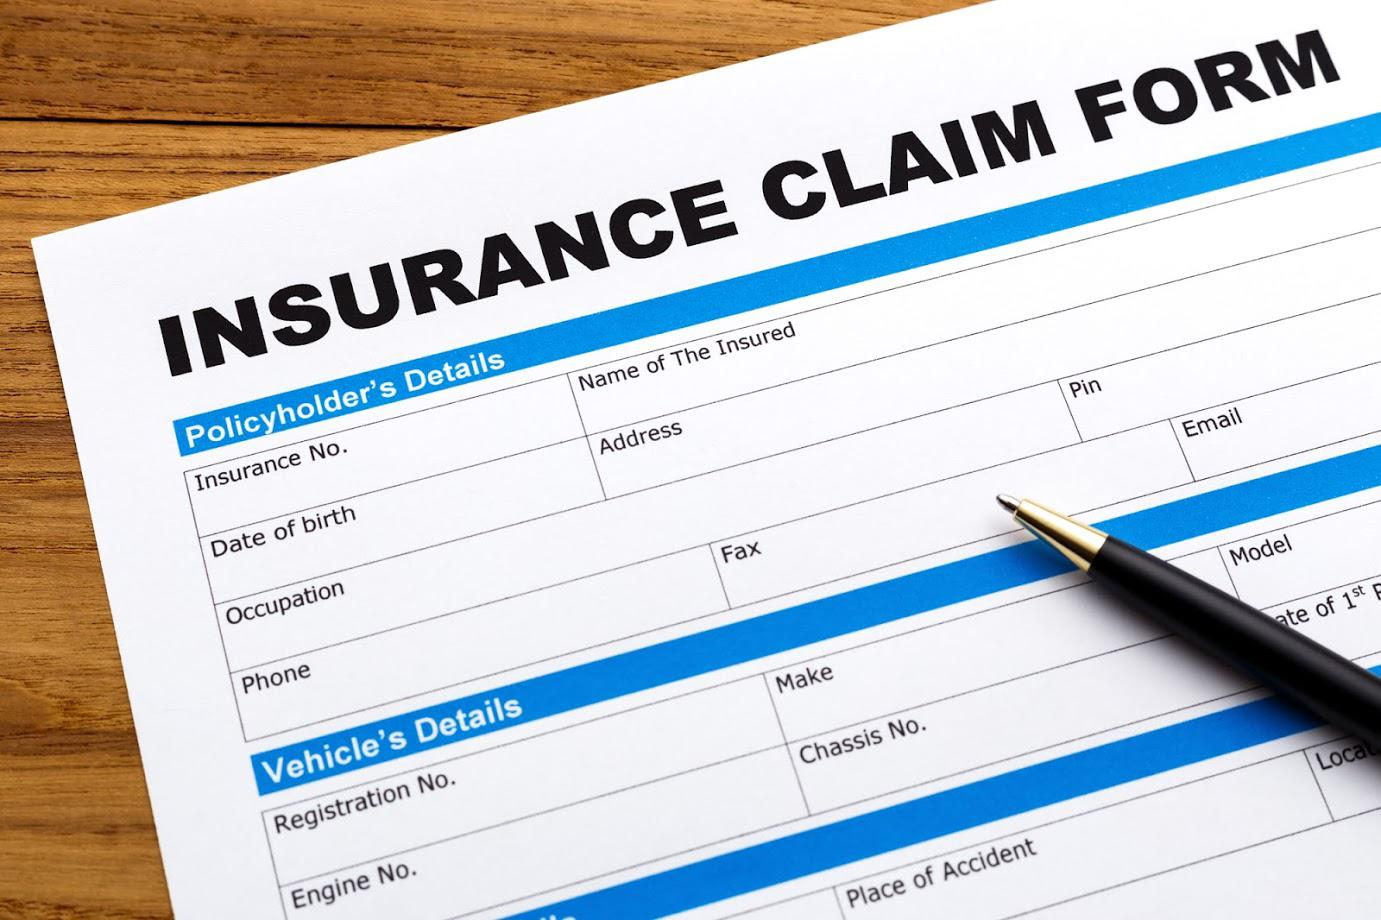 5 Common Reasons for Health Insurance Claim Denial